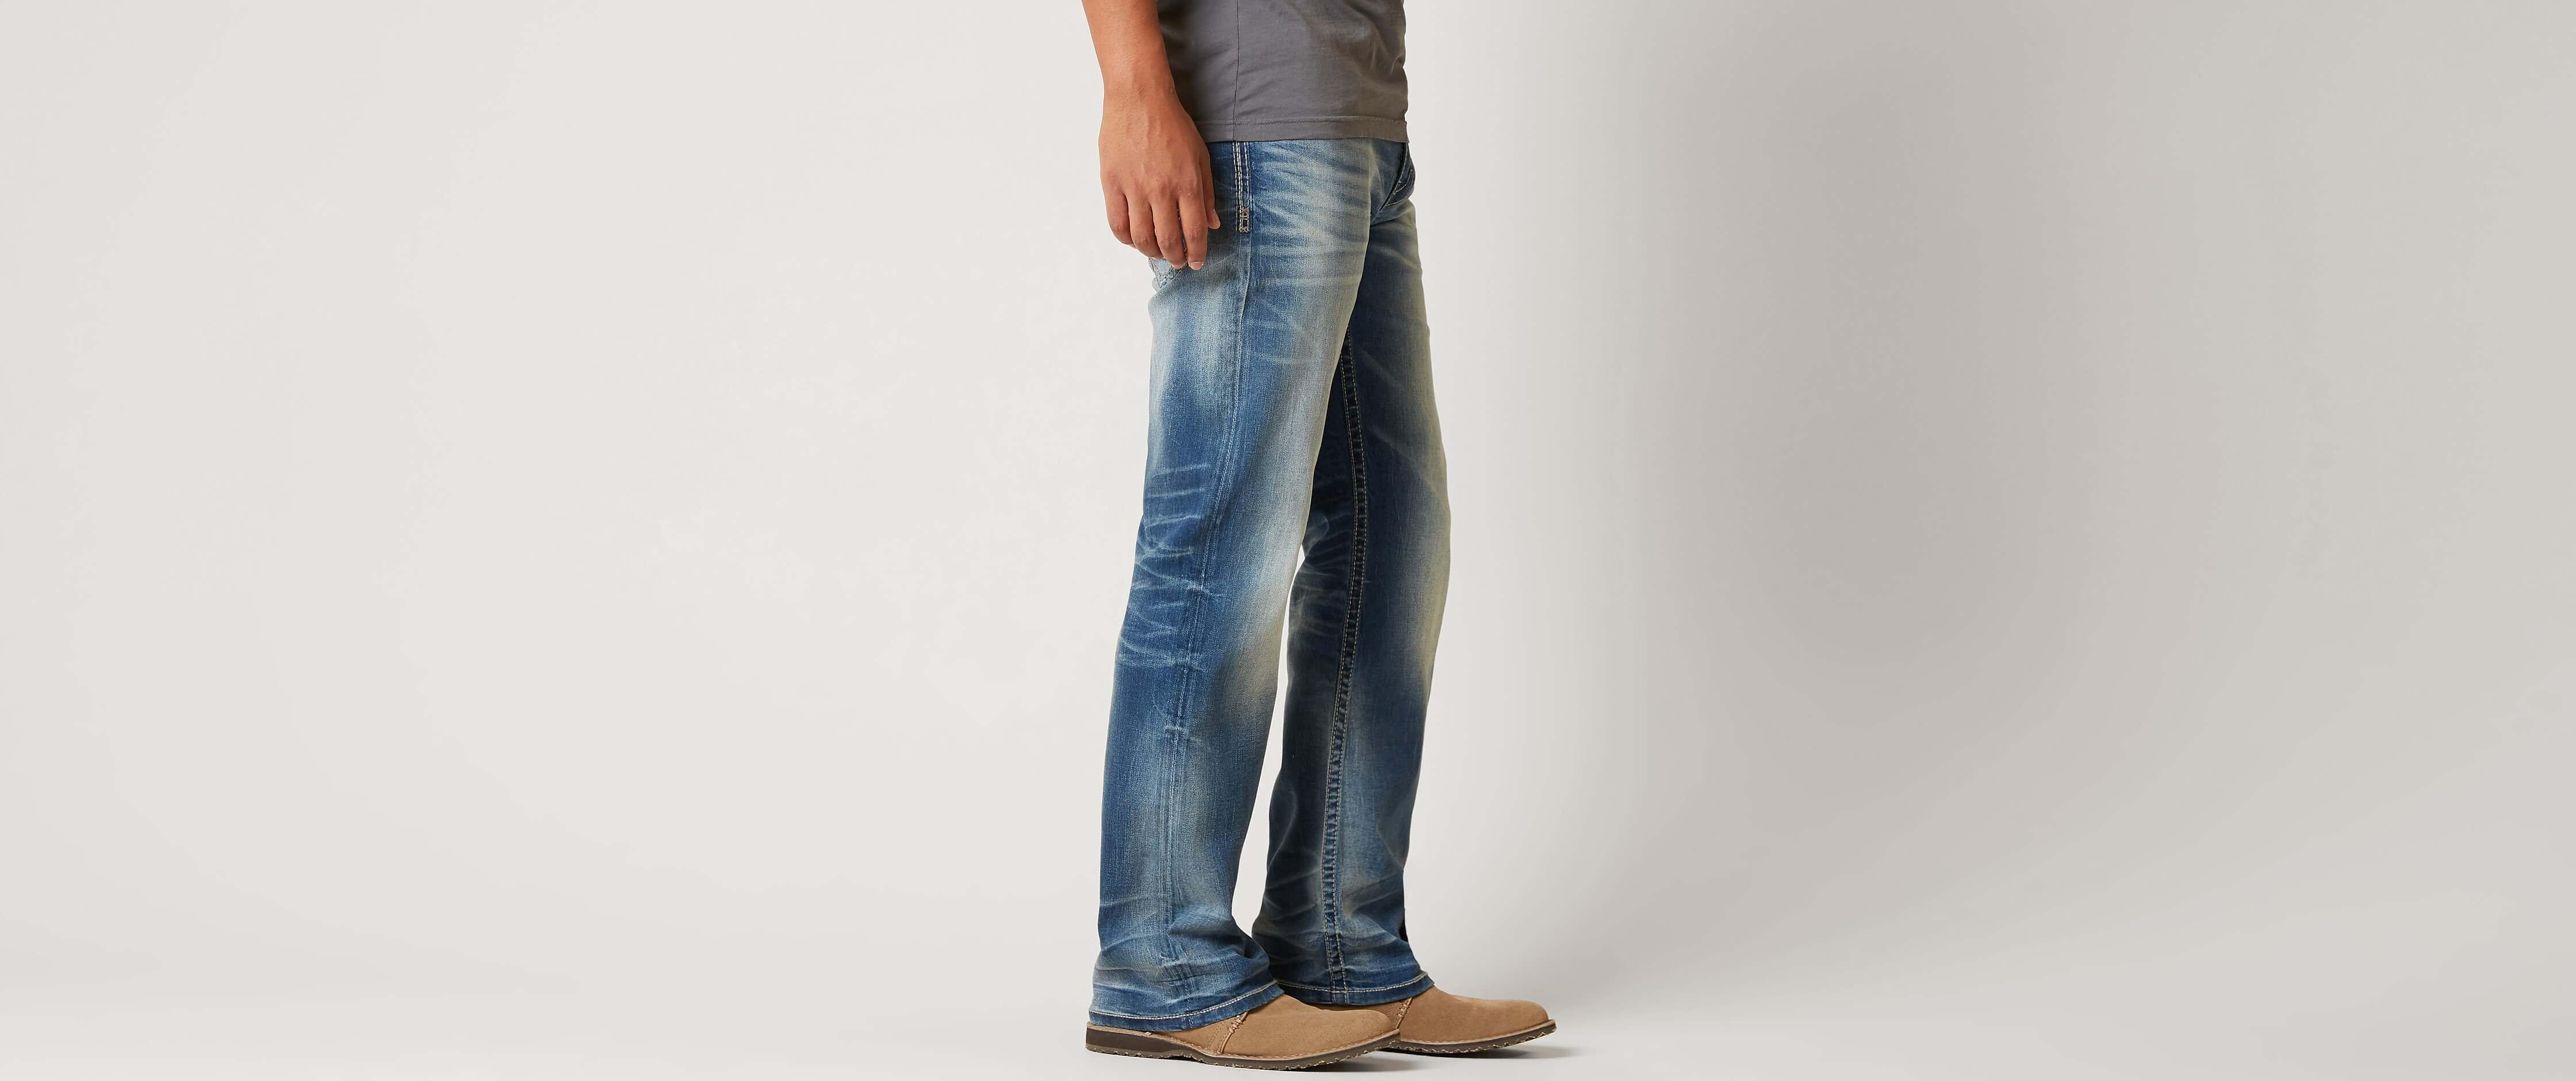 850411363473 Buckle Black Nine Boot Stretch Jean [6XuXh0107318] - $37.99